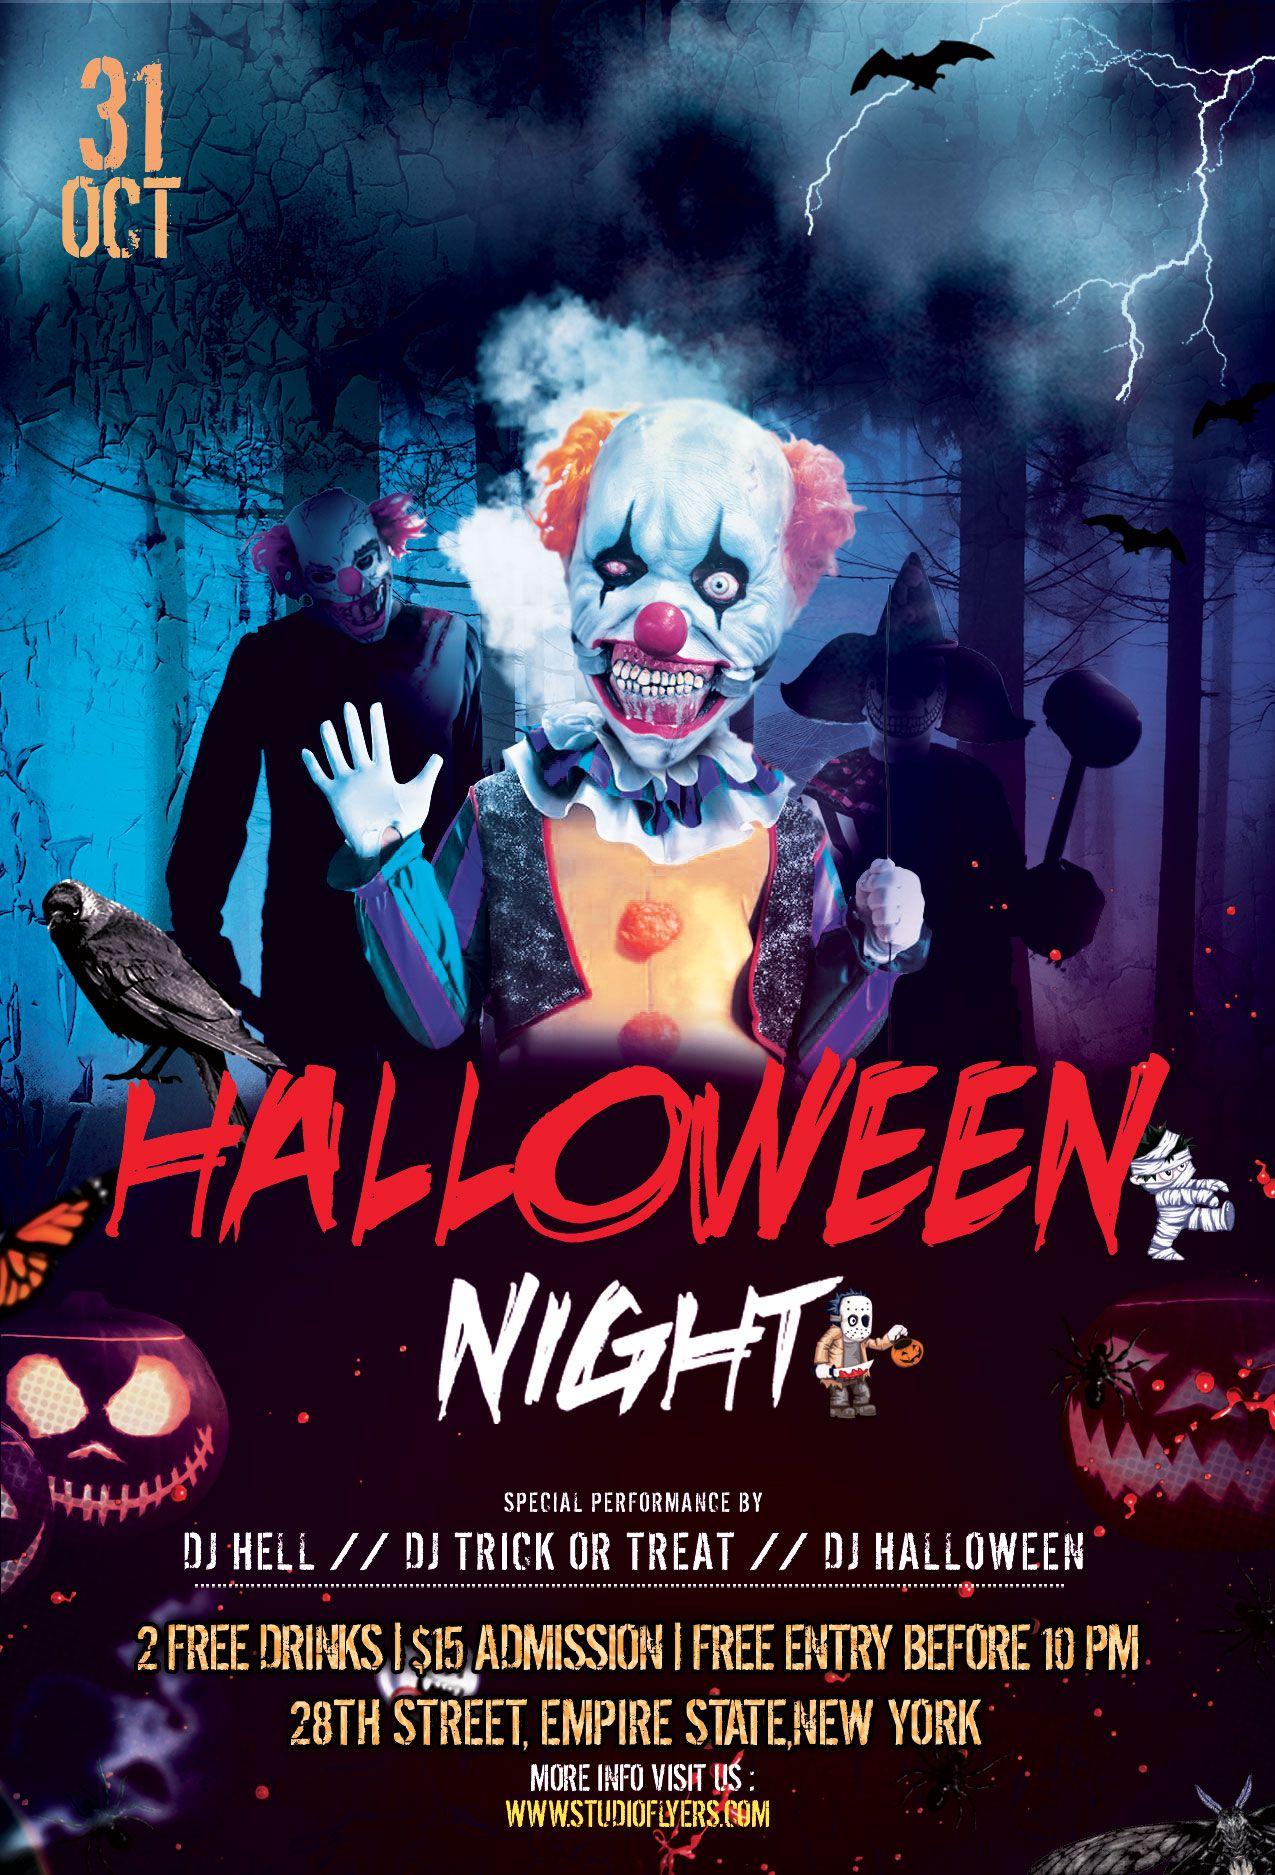 Halloween Spooky Download Free PSD Flyer Template